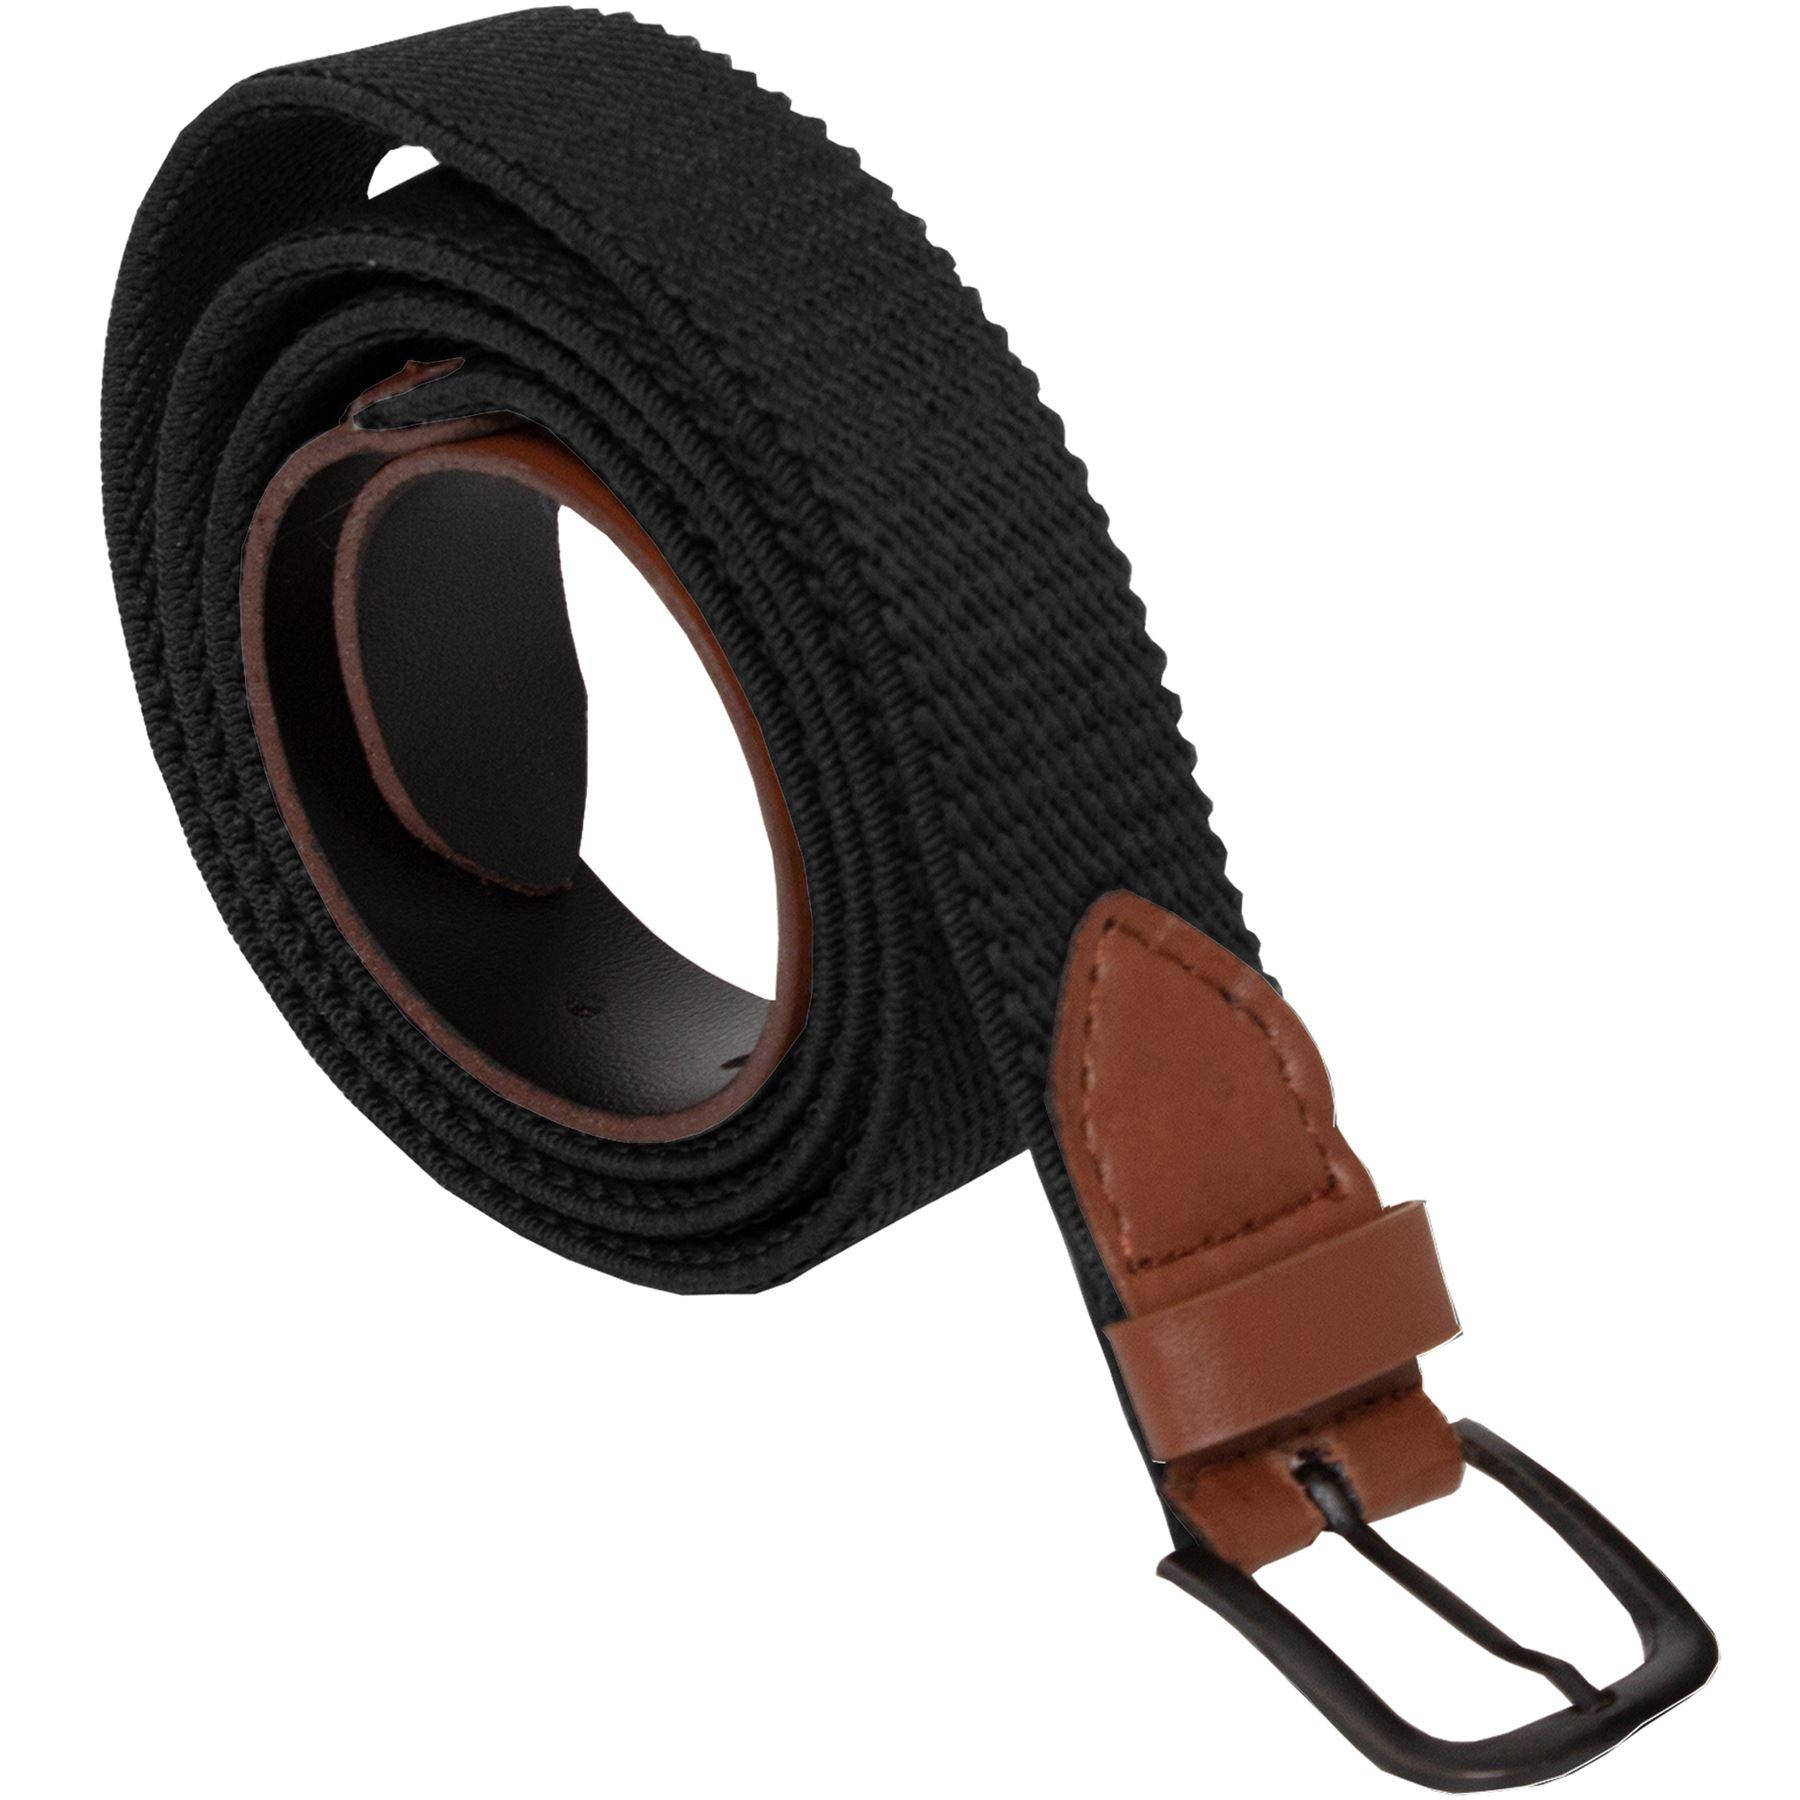 Mens-Ladies-Elasticated-Webbing-Belts-PU-Leather-Trim-Stretch-Canvas-Buckle-Belt Indexbild 11